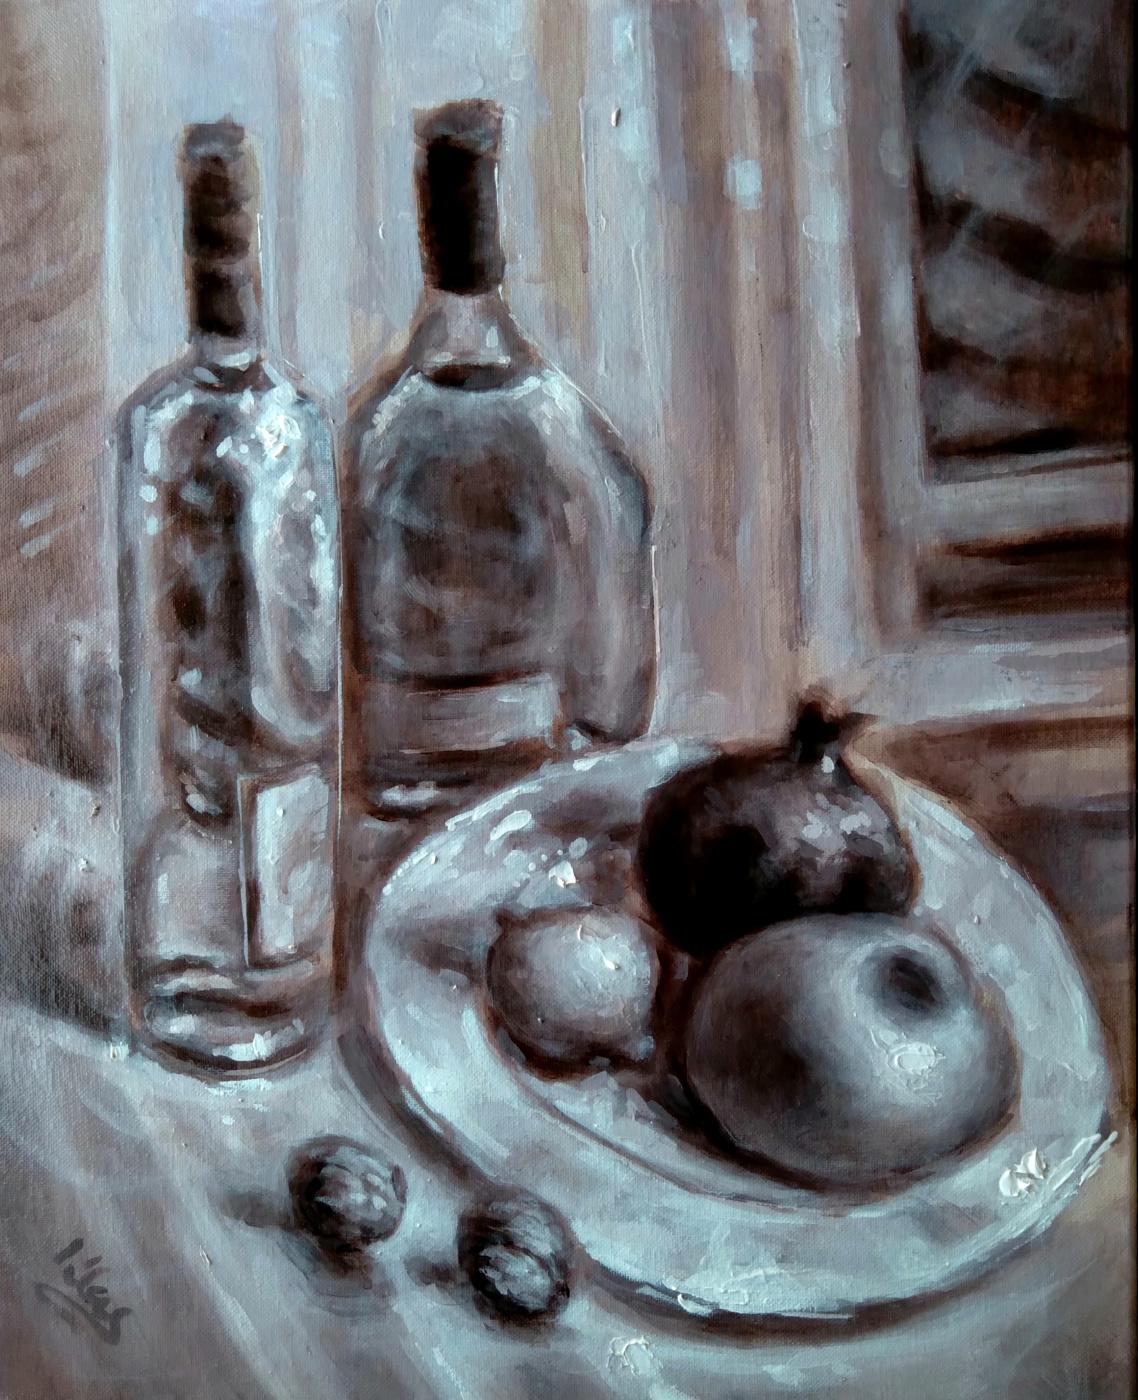 Alex Klas. Still life by the window. Monochrome painting